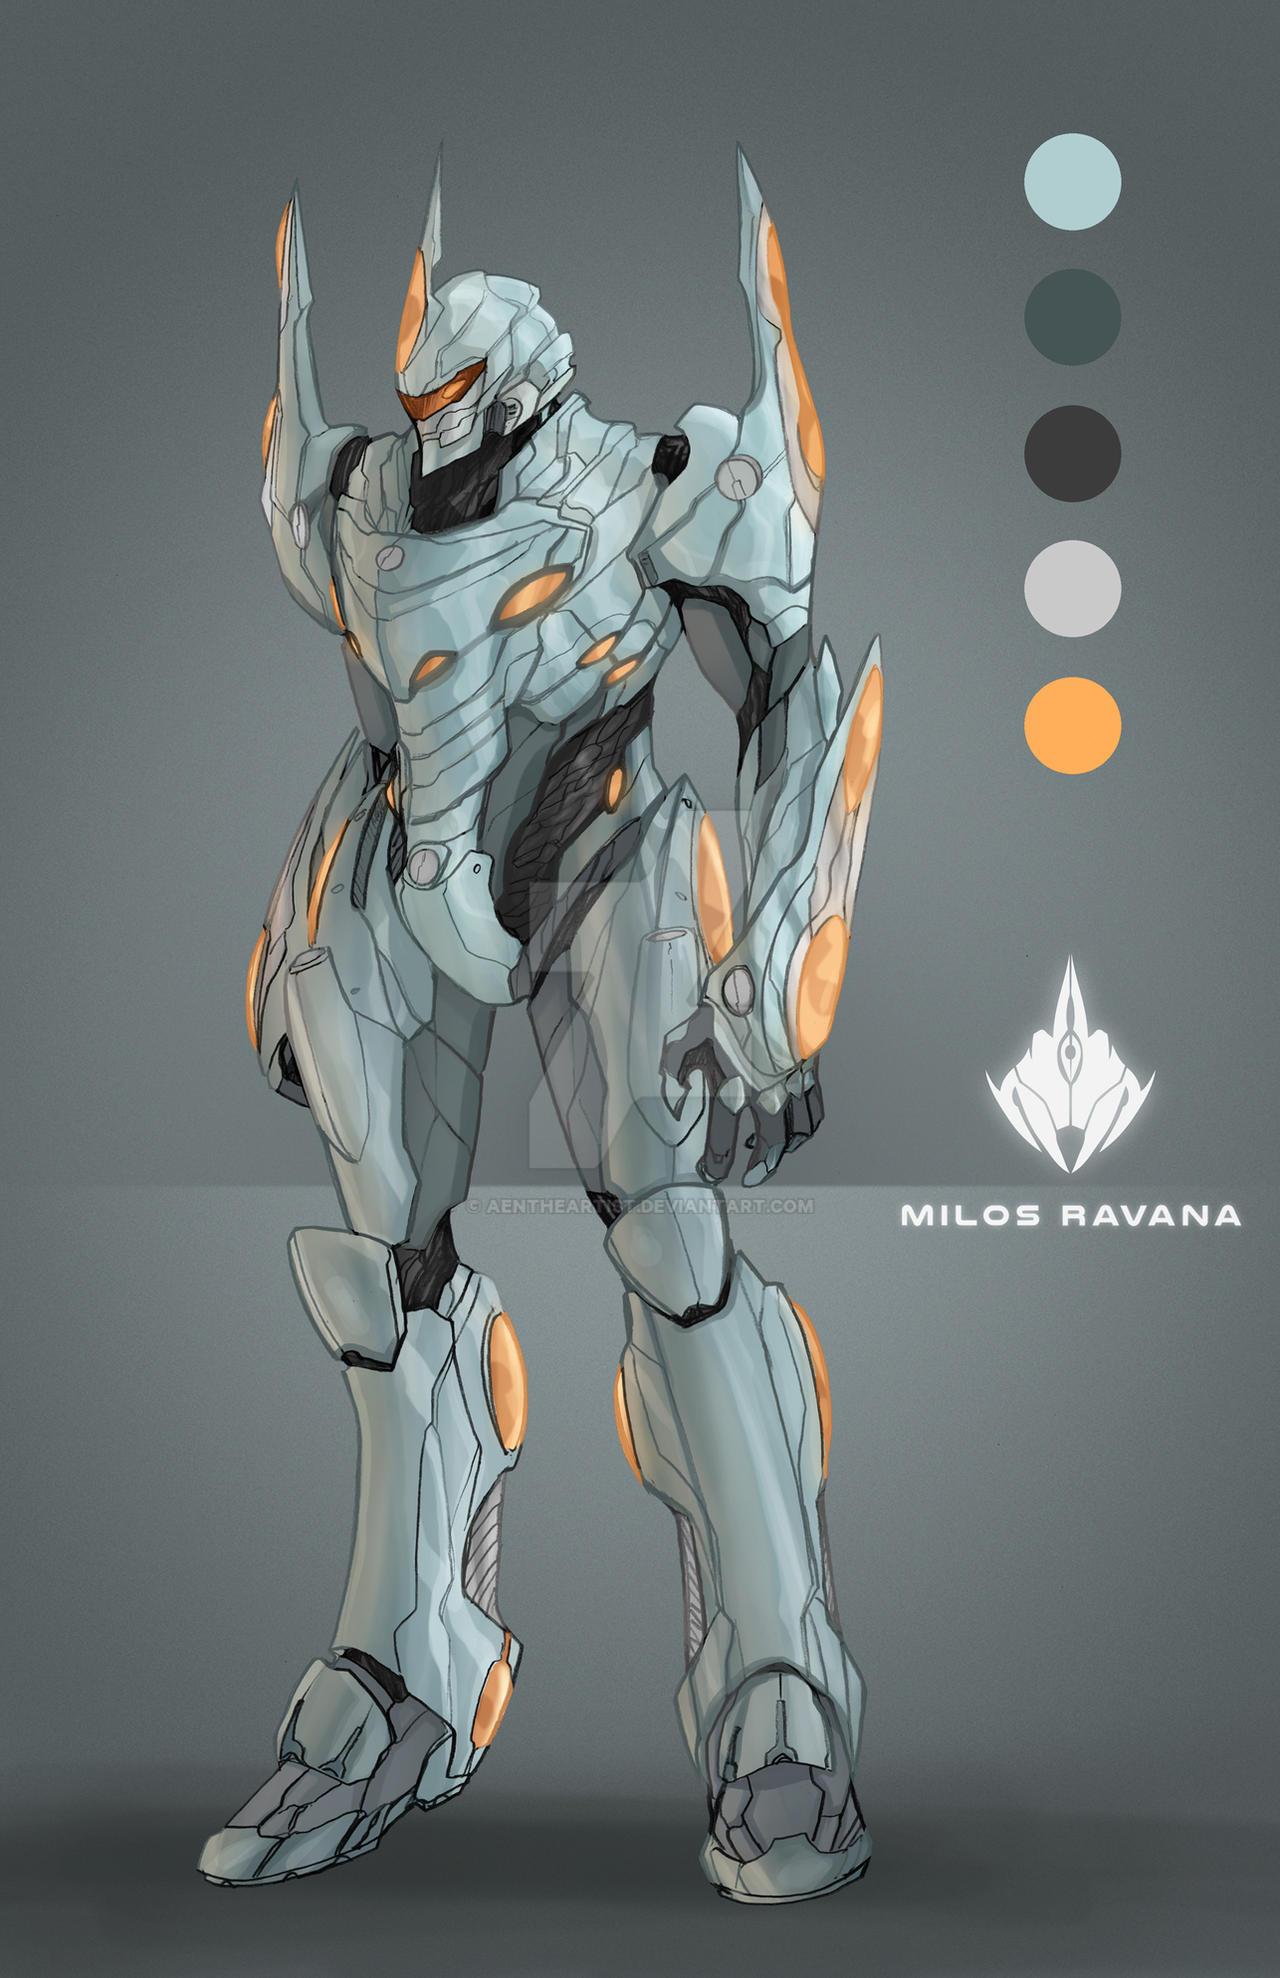 the armor of god milos ravana v2 0 by aentheartist on deviantart